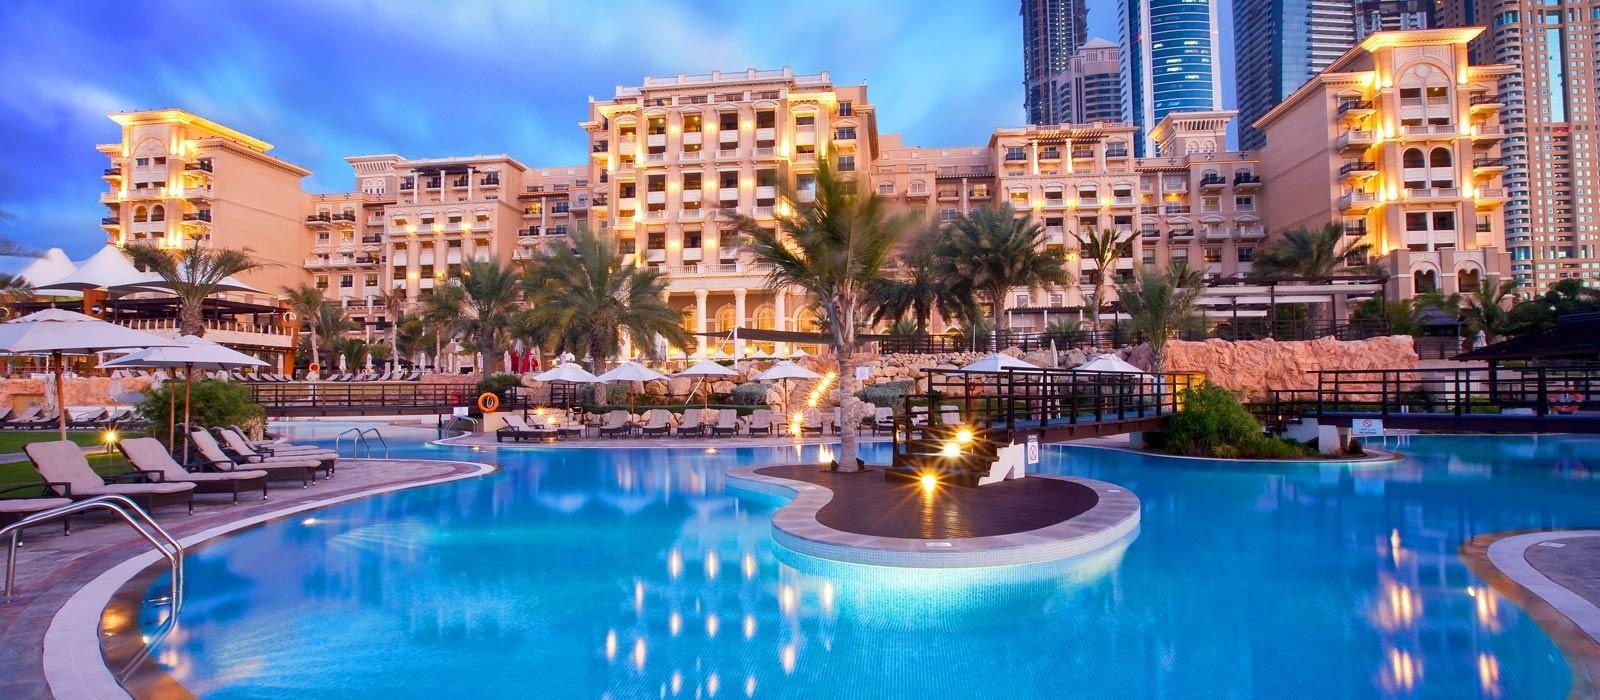 header - The Westin Dubai Mina Seyahi - Luxury Dubai holiday packages